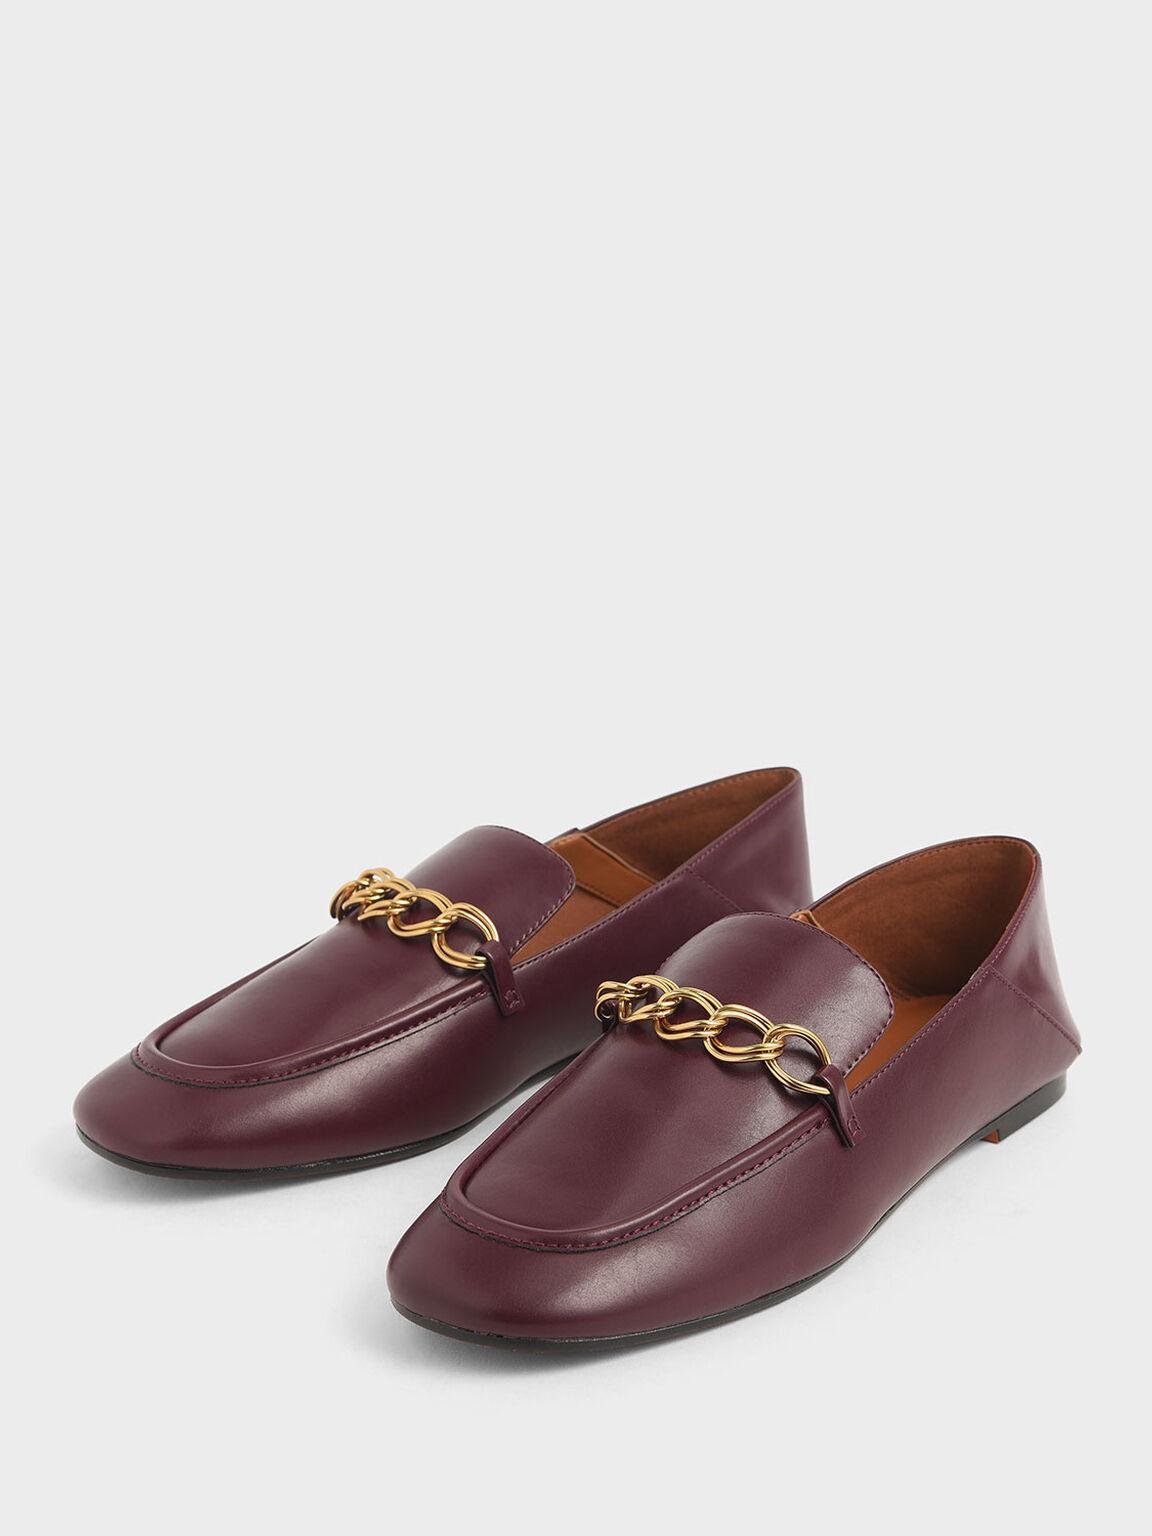 金屬鍊樂福鞋, 深紫紅, hi-res